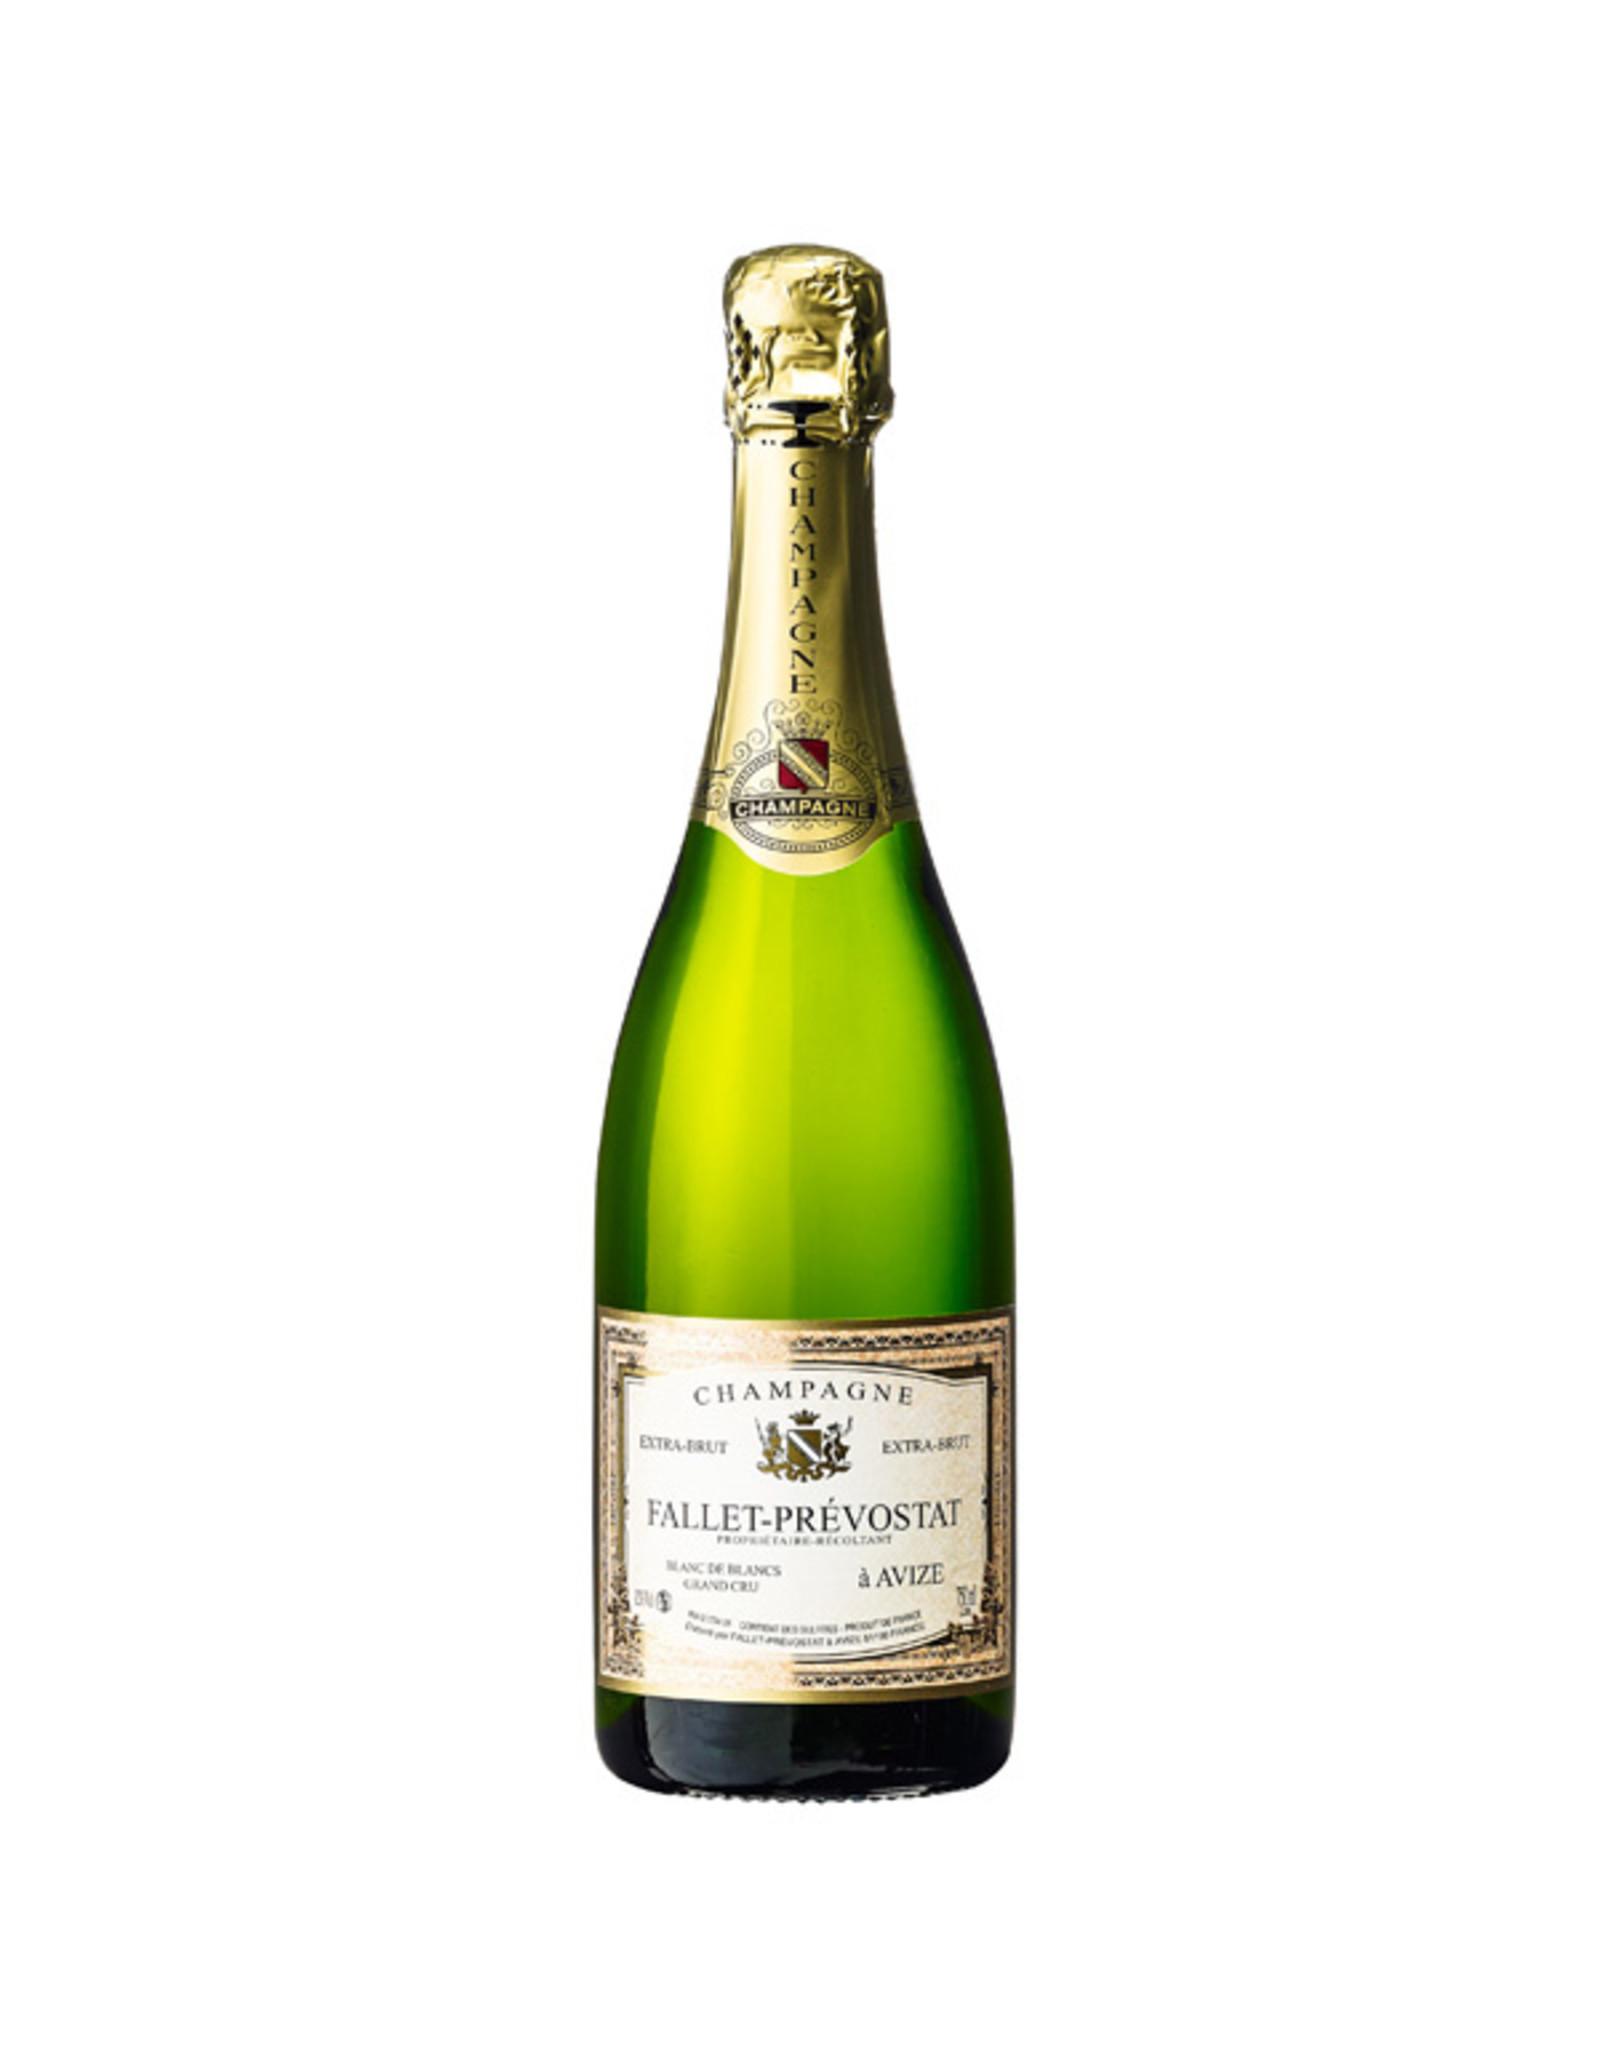 Champagne Fallet-Prevostat, Avize Fallet Prevostat Extra Brut